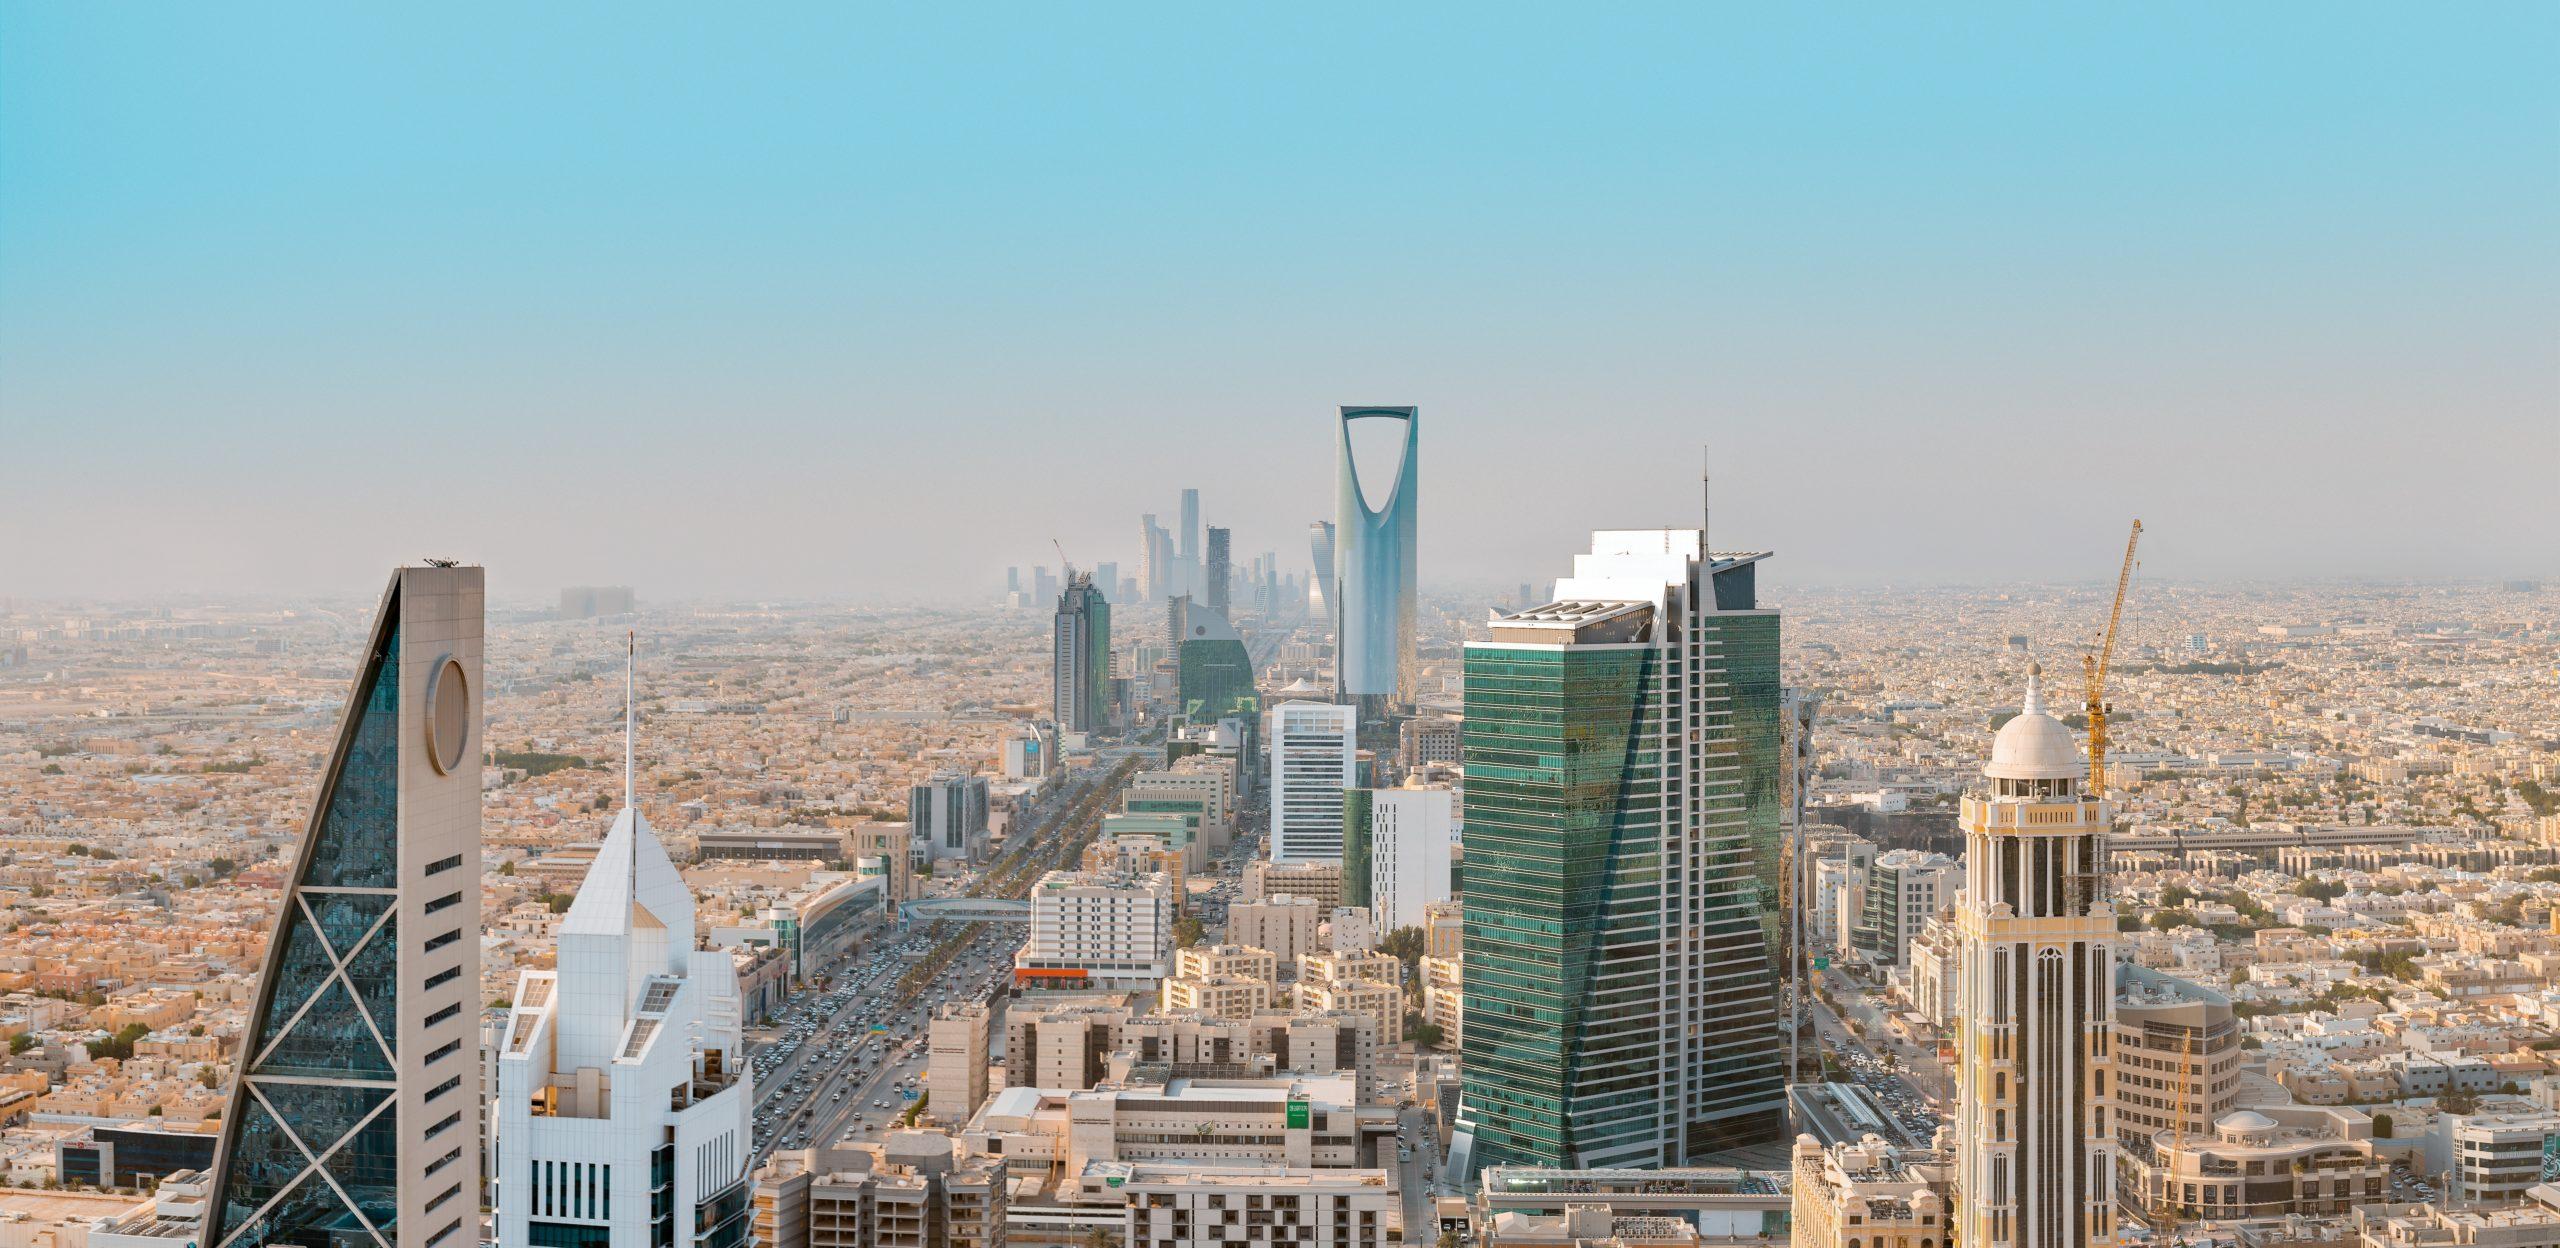 Saudi Arabia [Shutterstock]